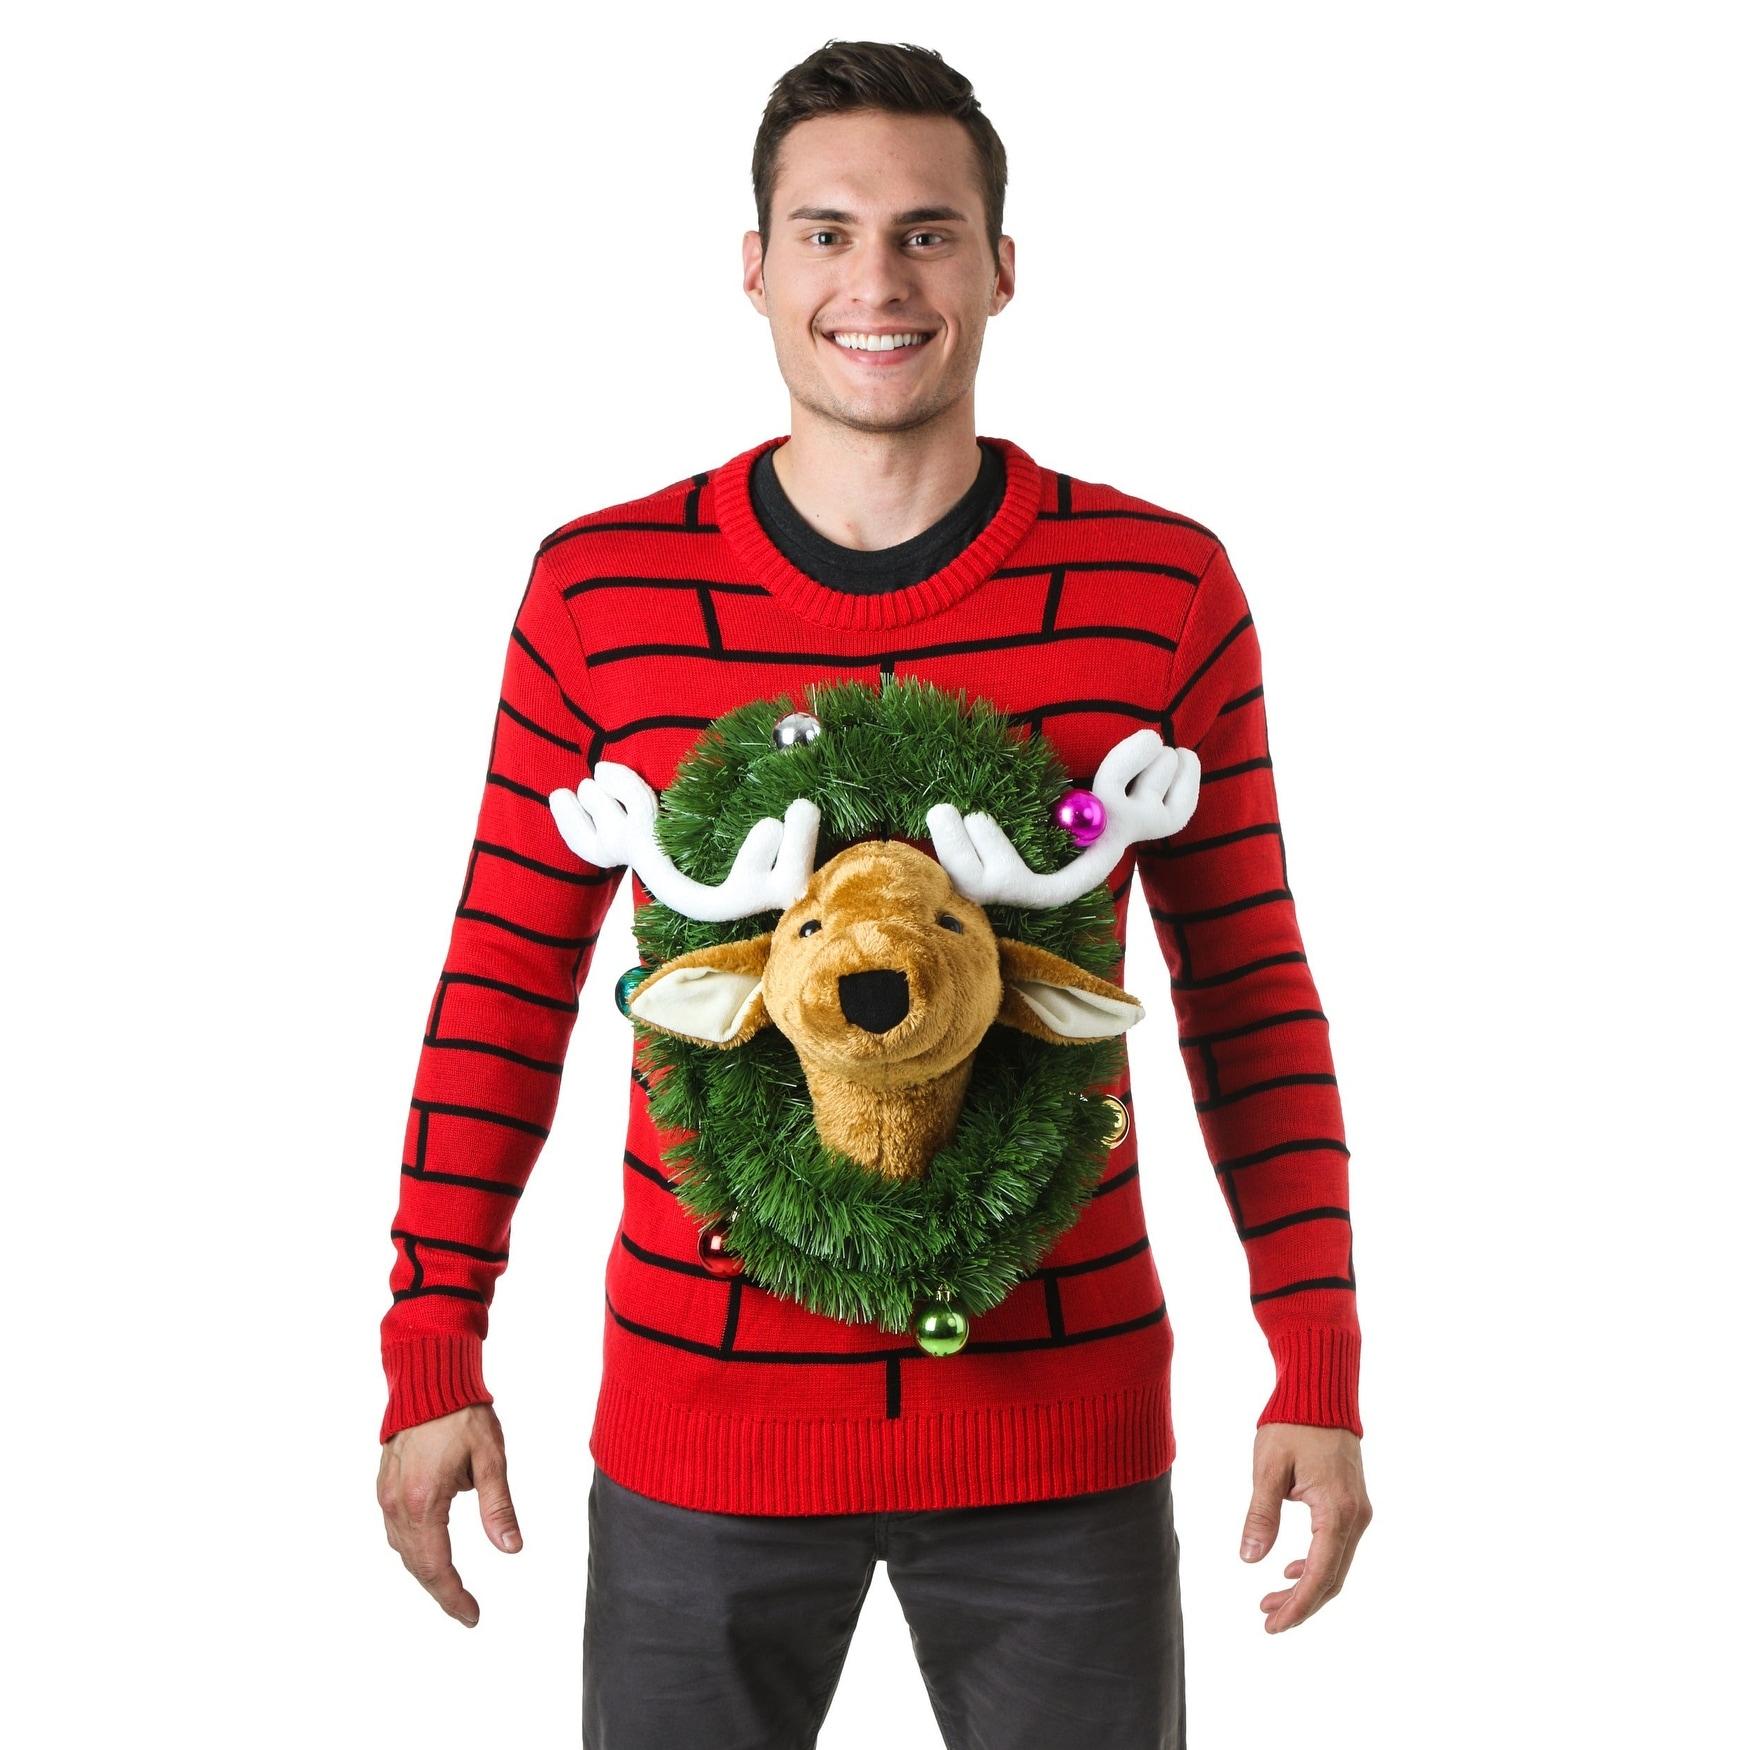 Deer Christmas Sweater | www.topsimages.com